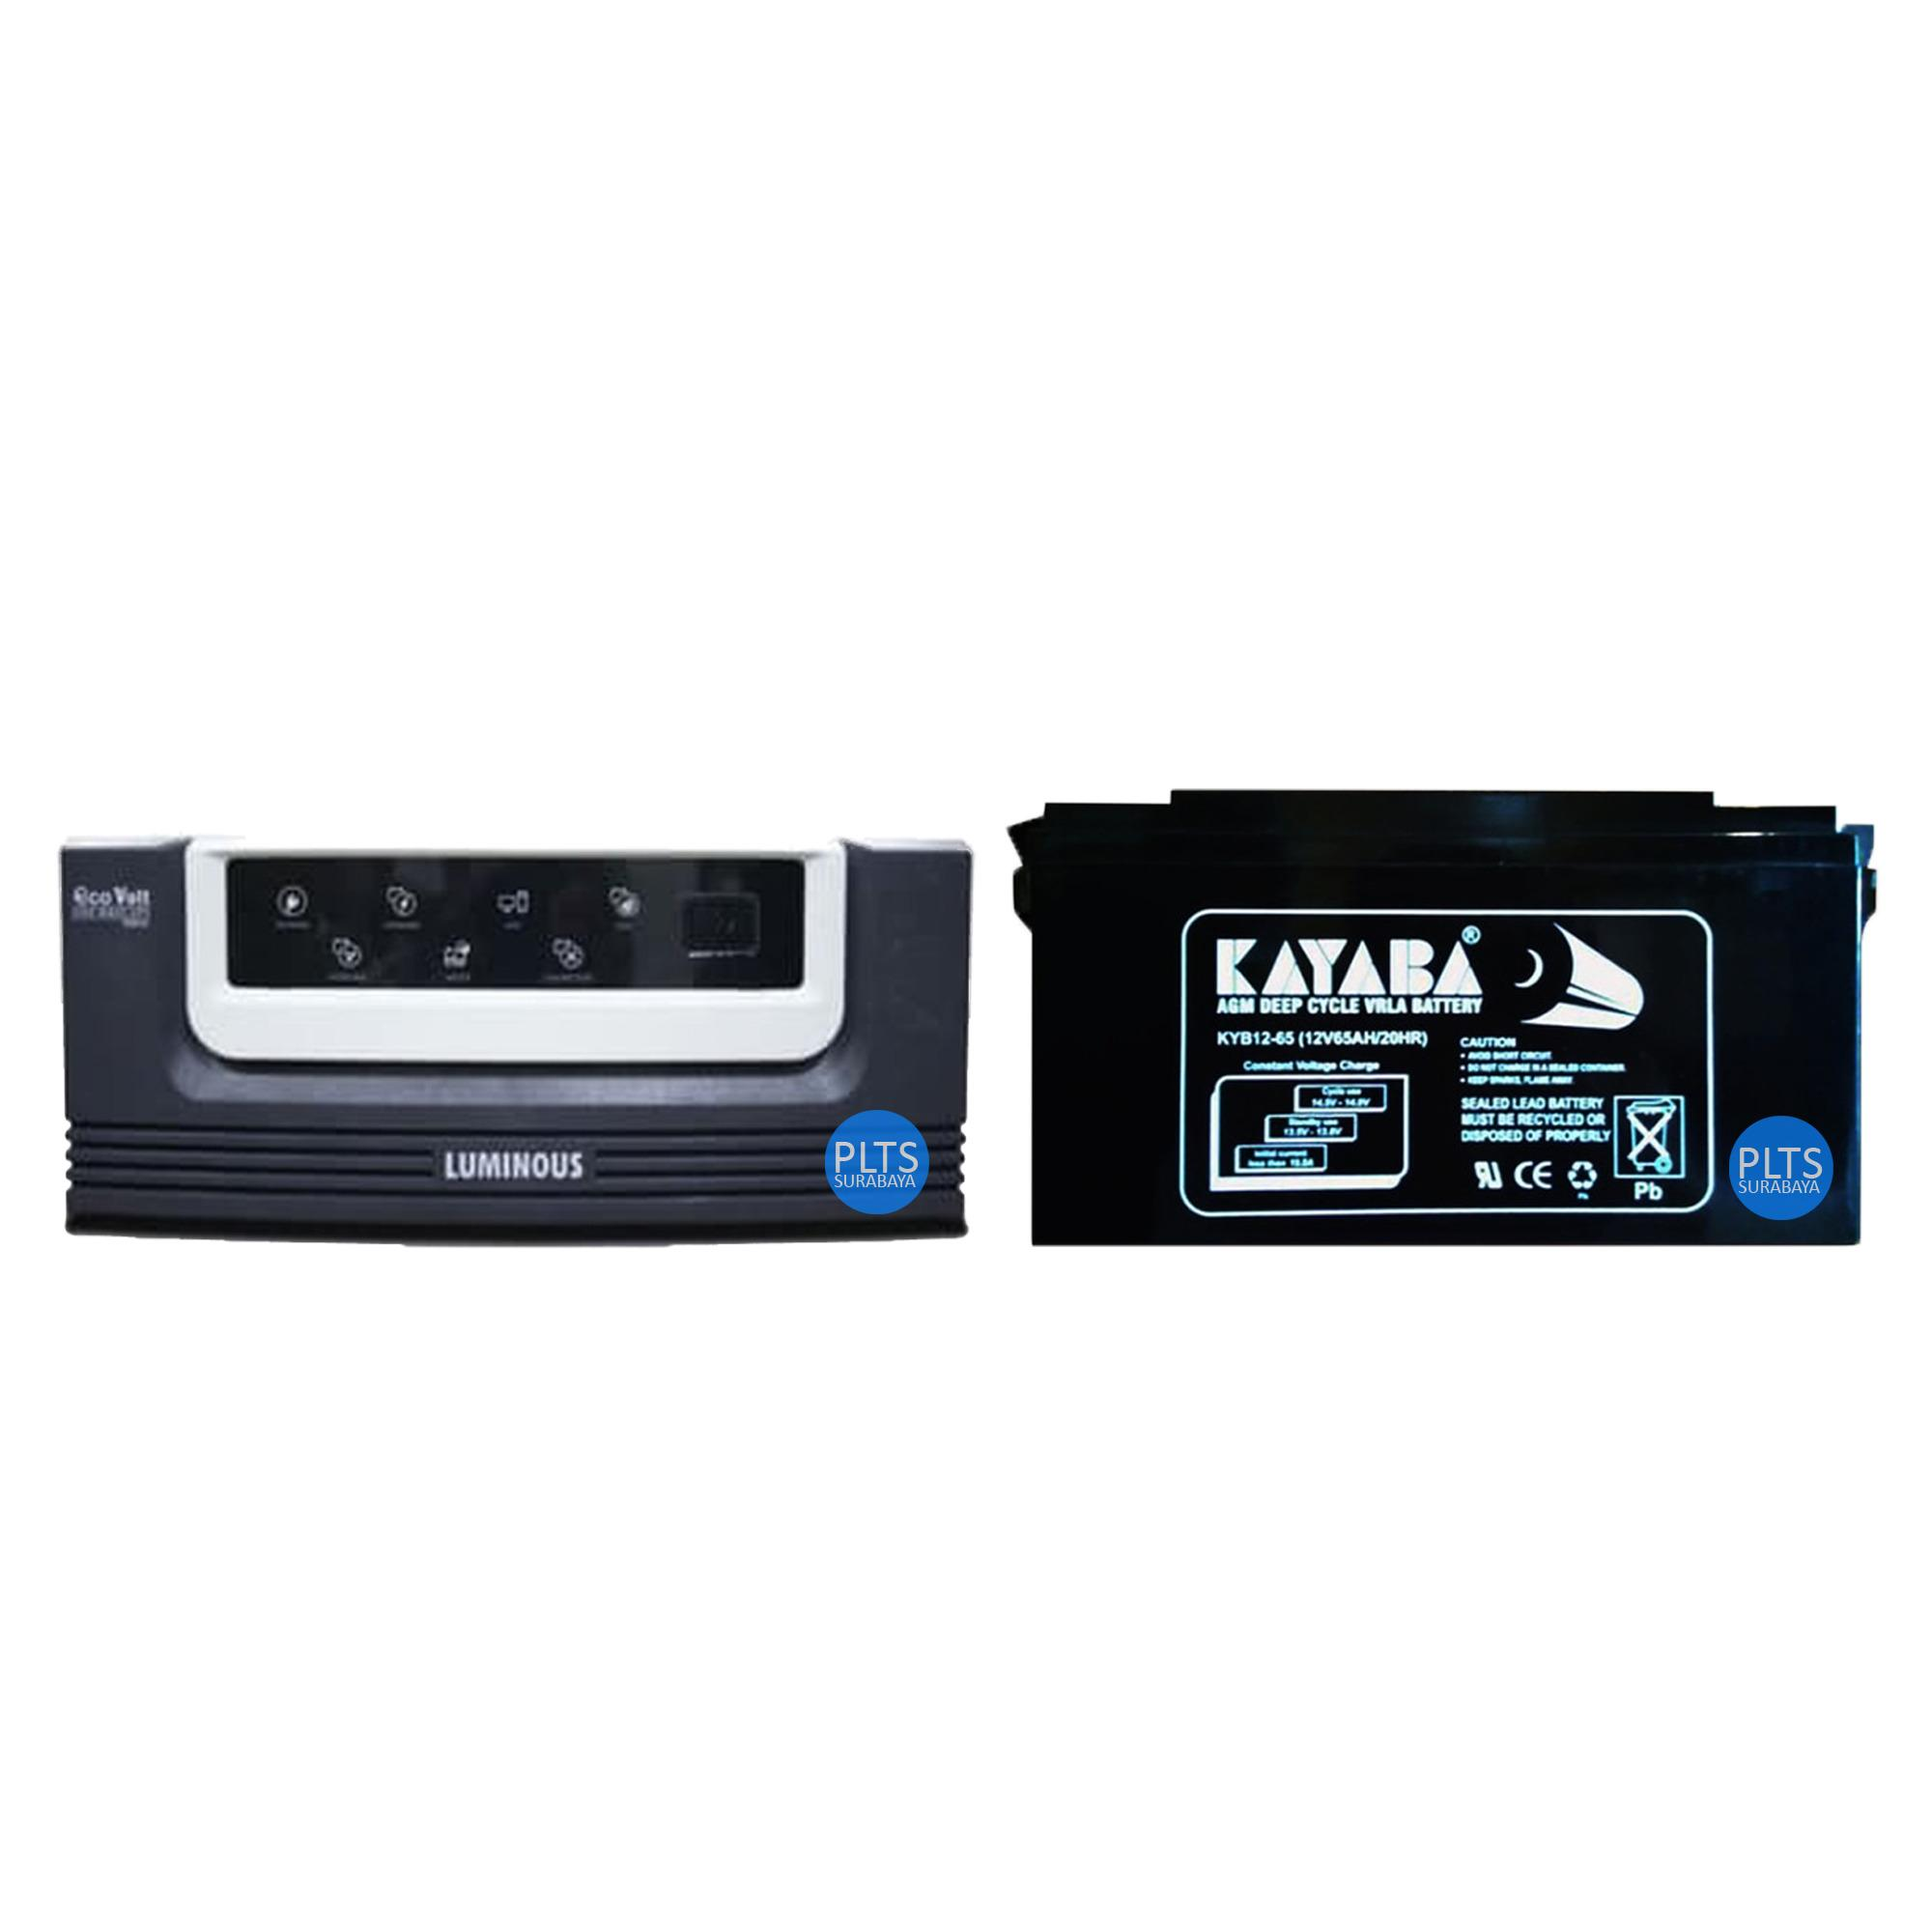 Paket Hemat Luminous ECOVOLT 900VA + Aki Kering VRLA Kayaba 12V 65Ah